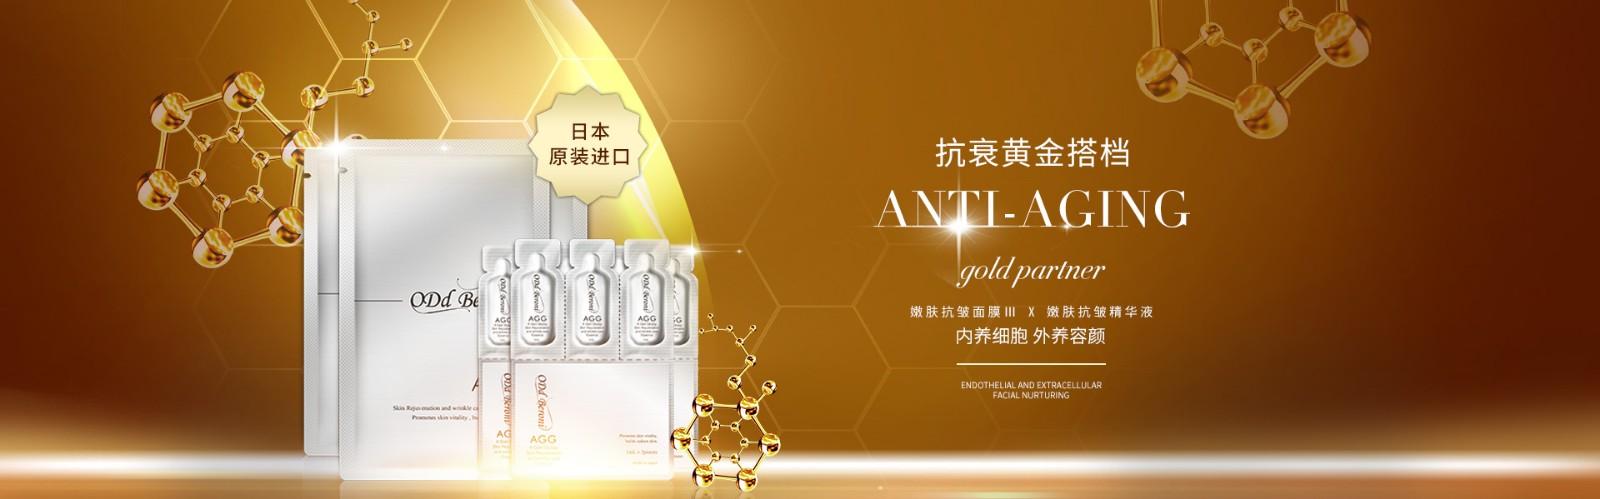 AGG产品banner3